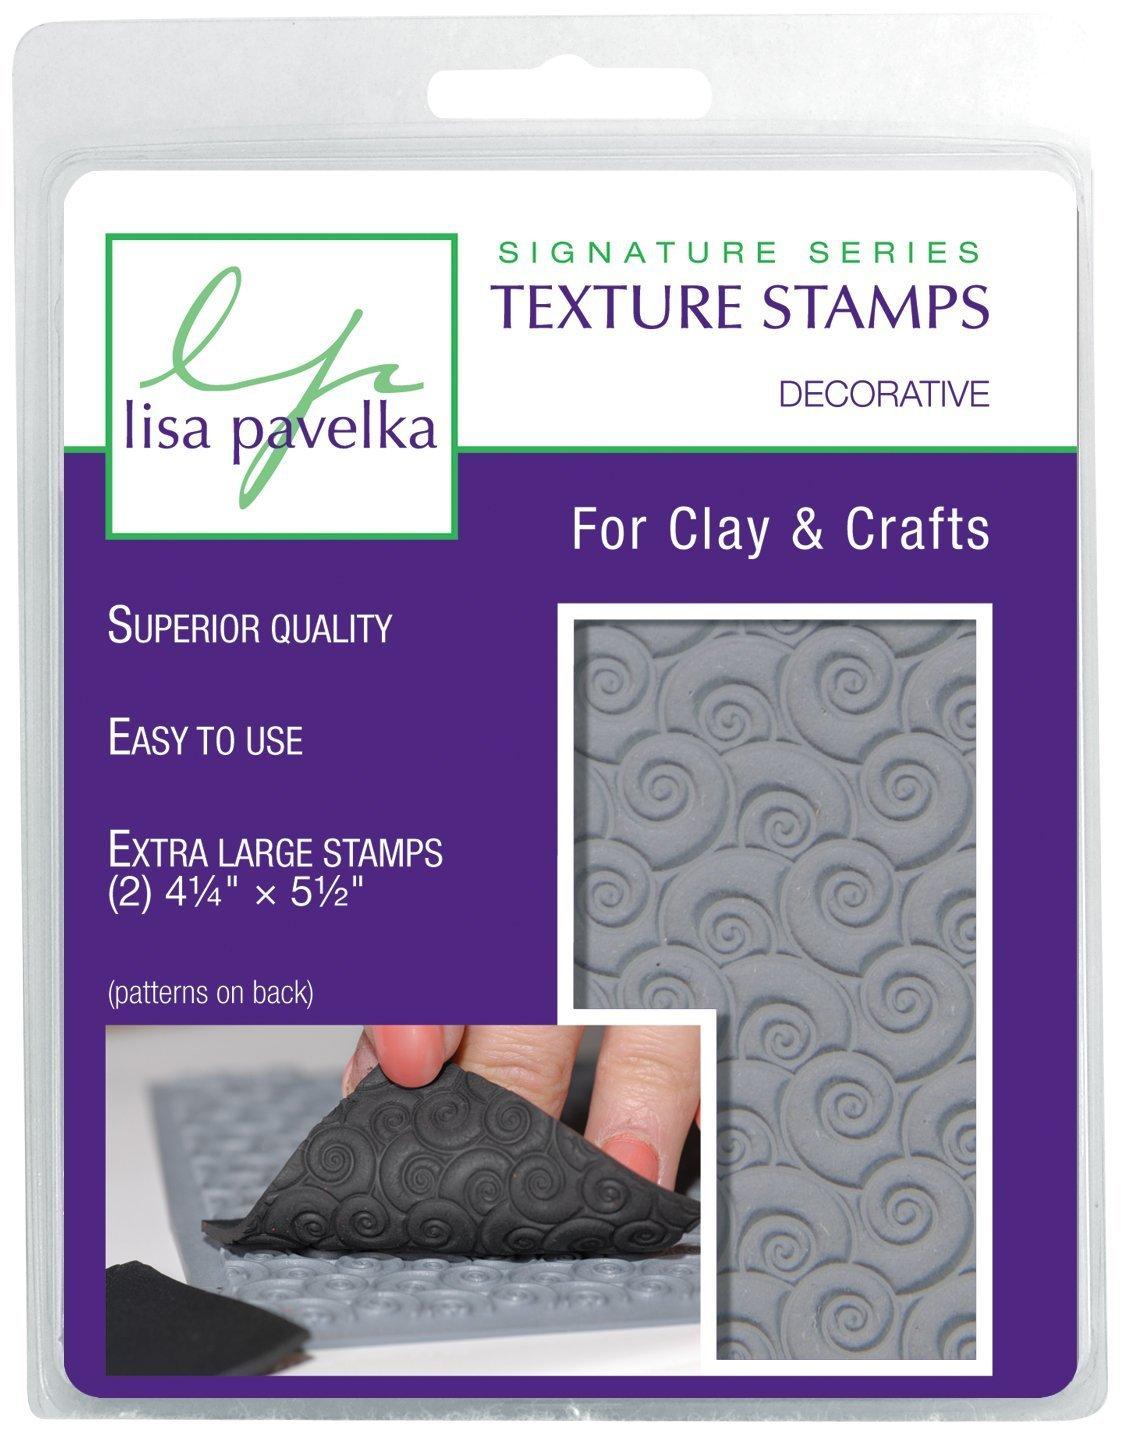 Lisa Pavelka Texture Stamp Kit Decorative Style #068